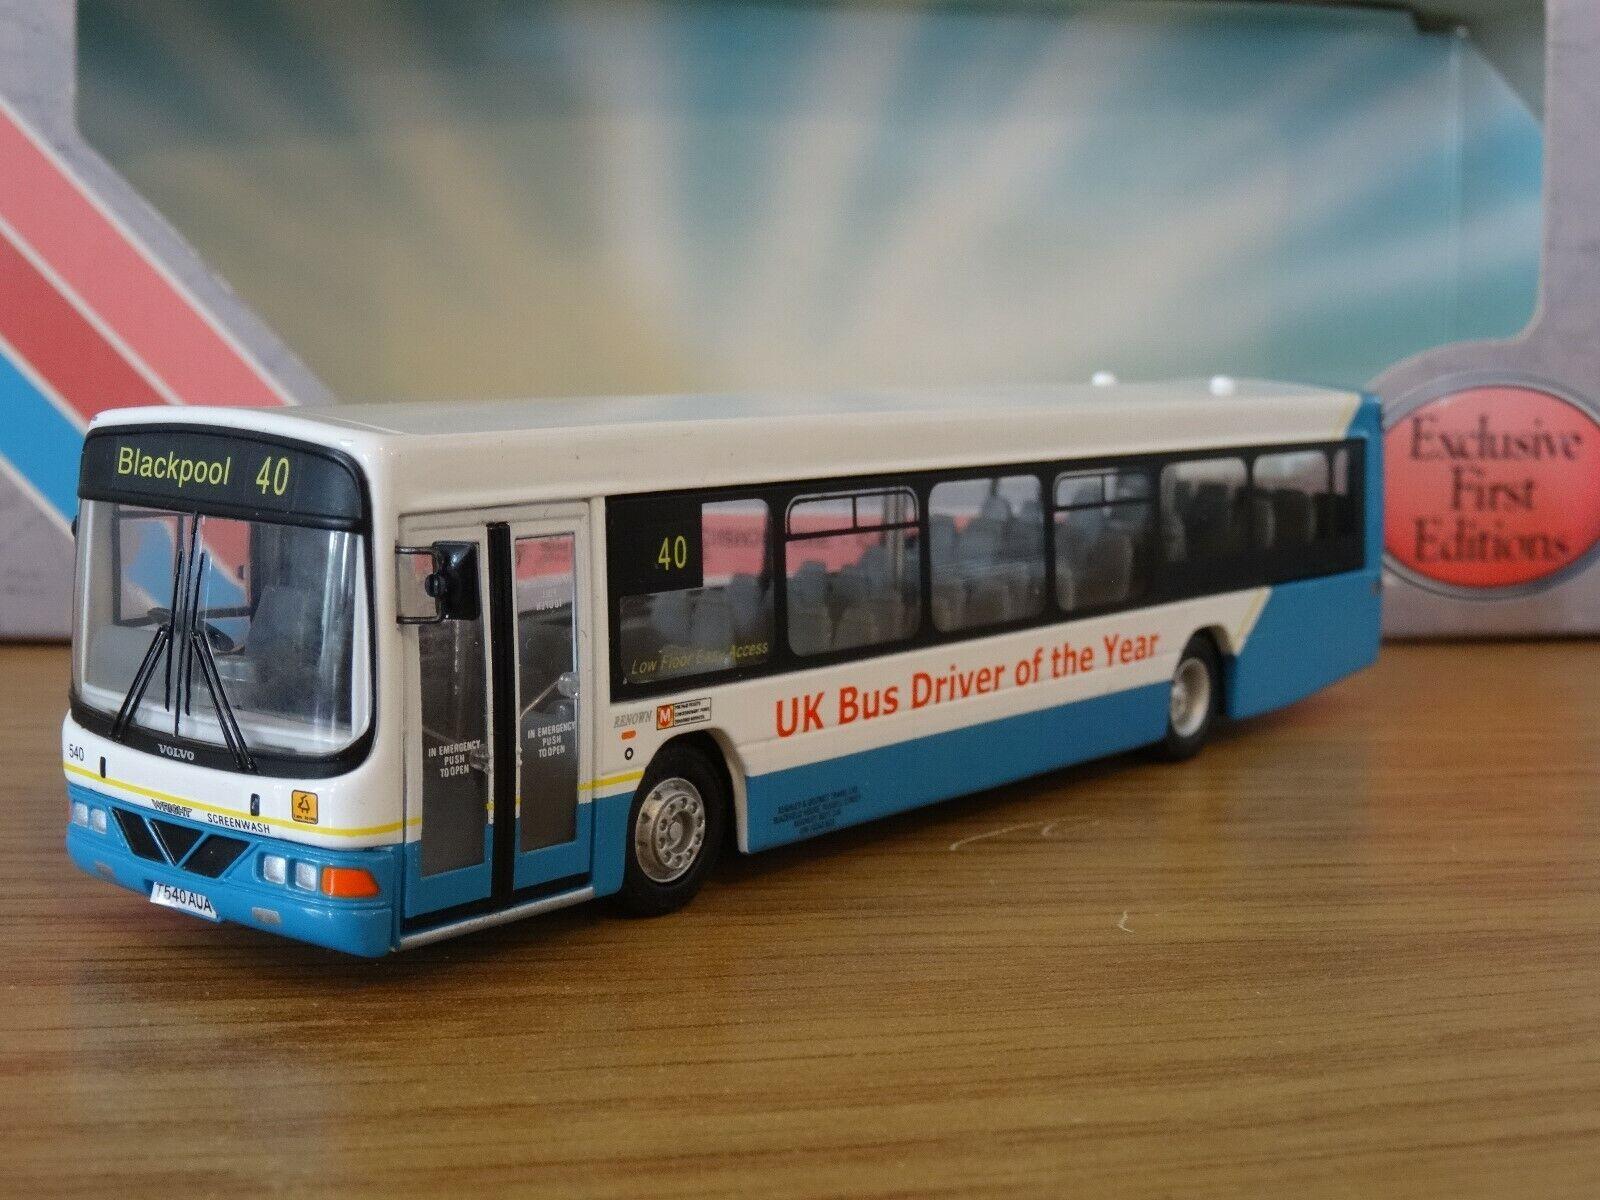 Efe Reino Unido chofer de autobús del año 2006 Wright renombre VOLVO Bus Modelo 27612A 1 76